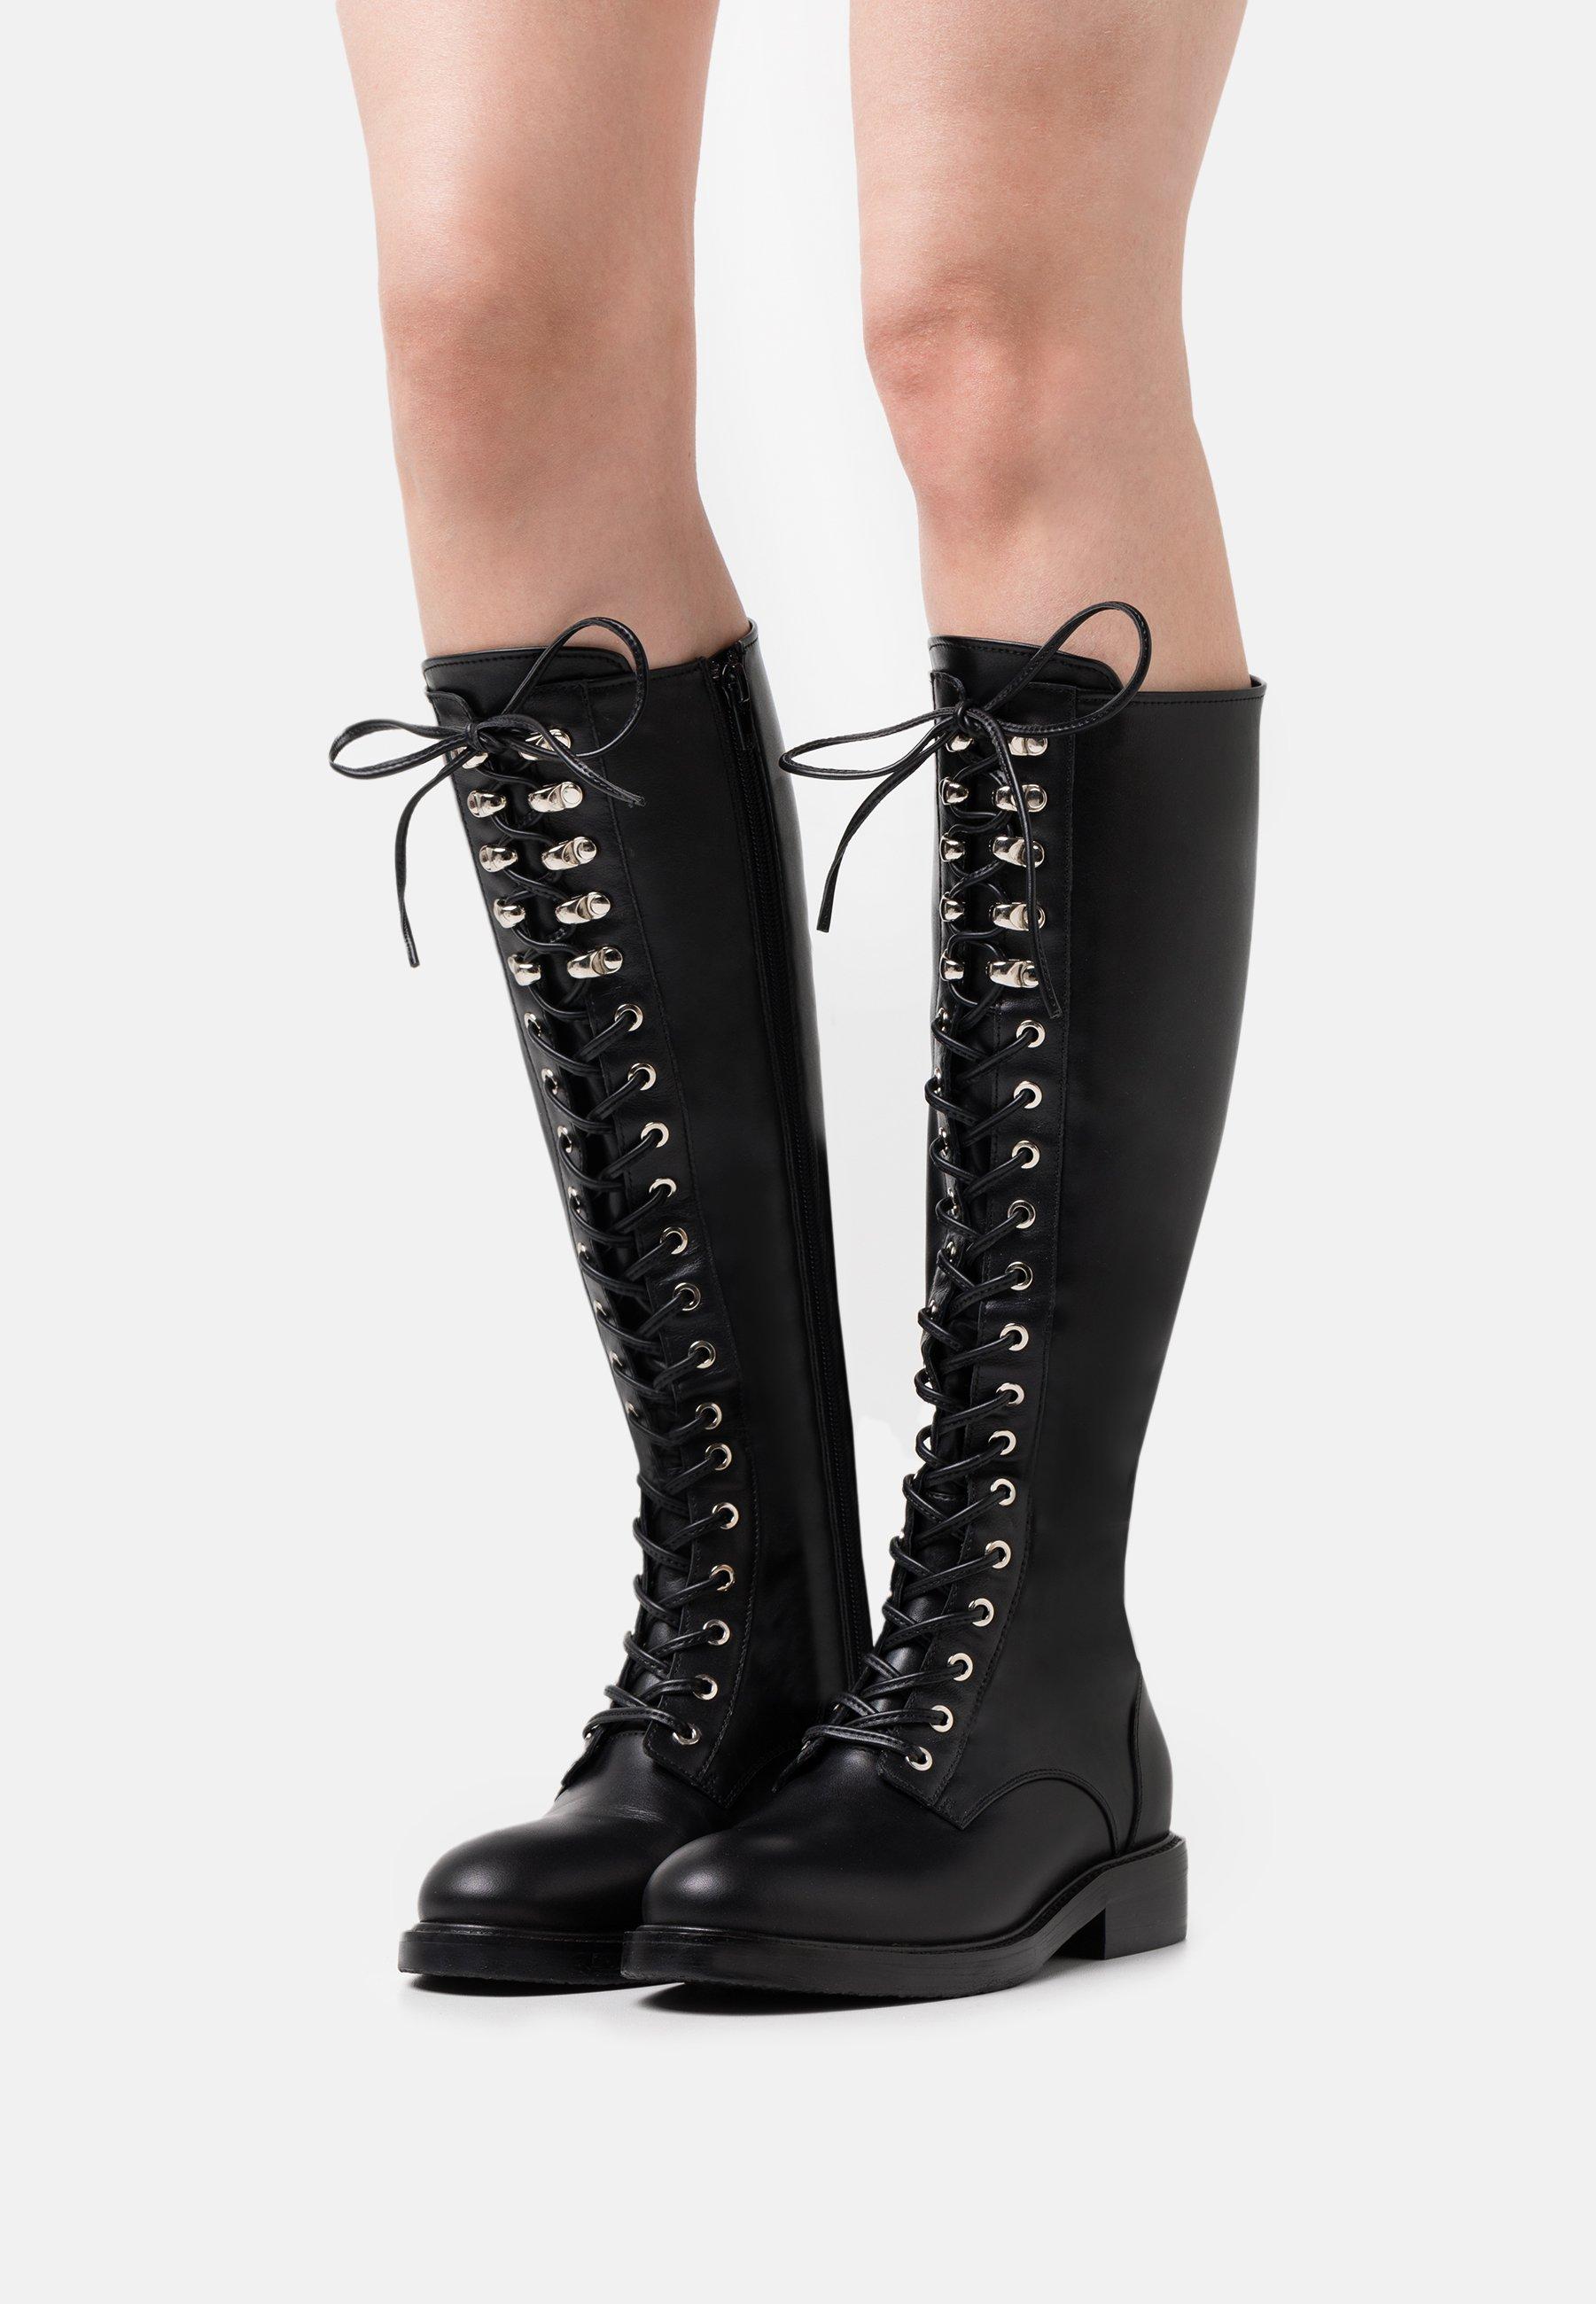 Women ARKIN - Lace-up boots - black